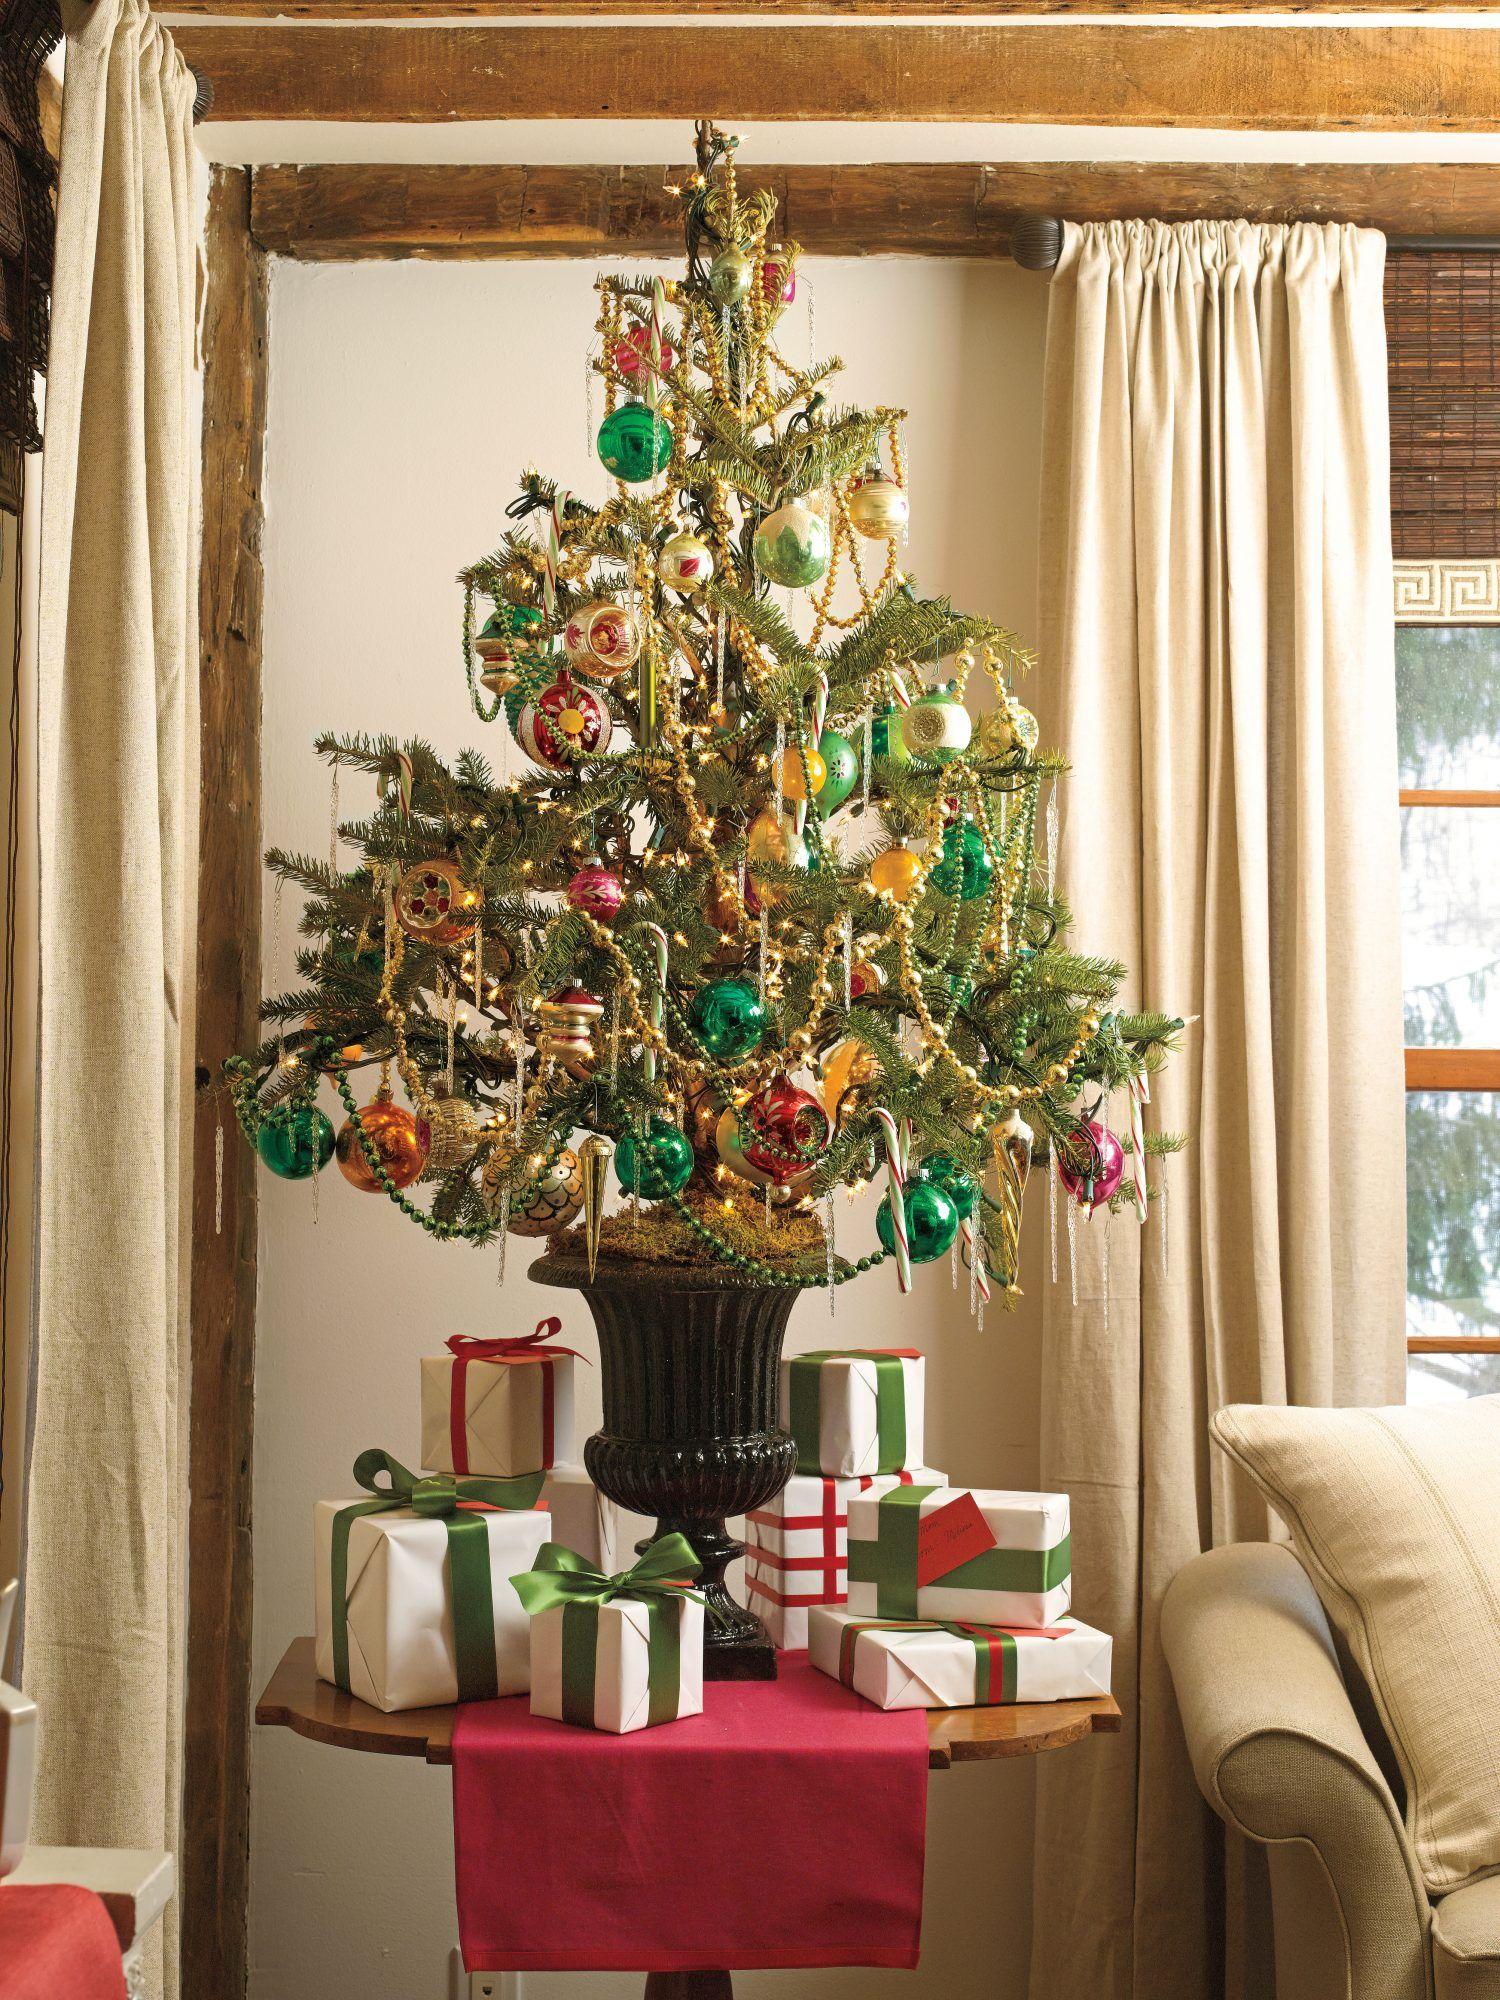 40 Christmas Tree Decoration Ideas And Christmas Trees Photos Christmas Tree Table Decorations Christmas Table Decorations Traditional Christmas Tree